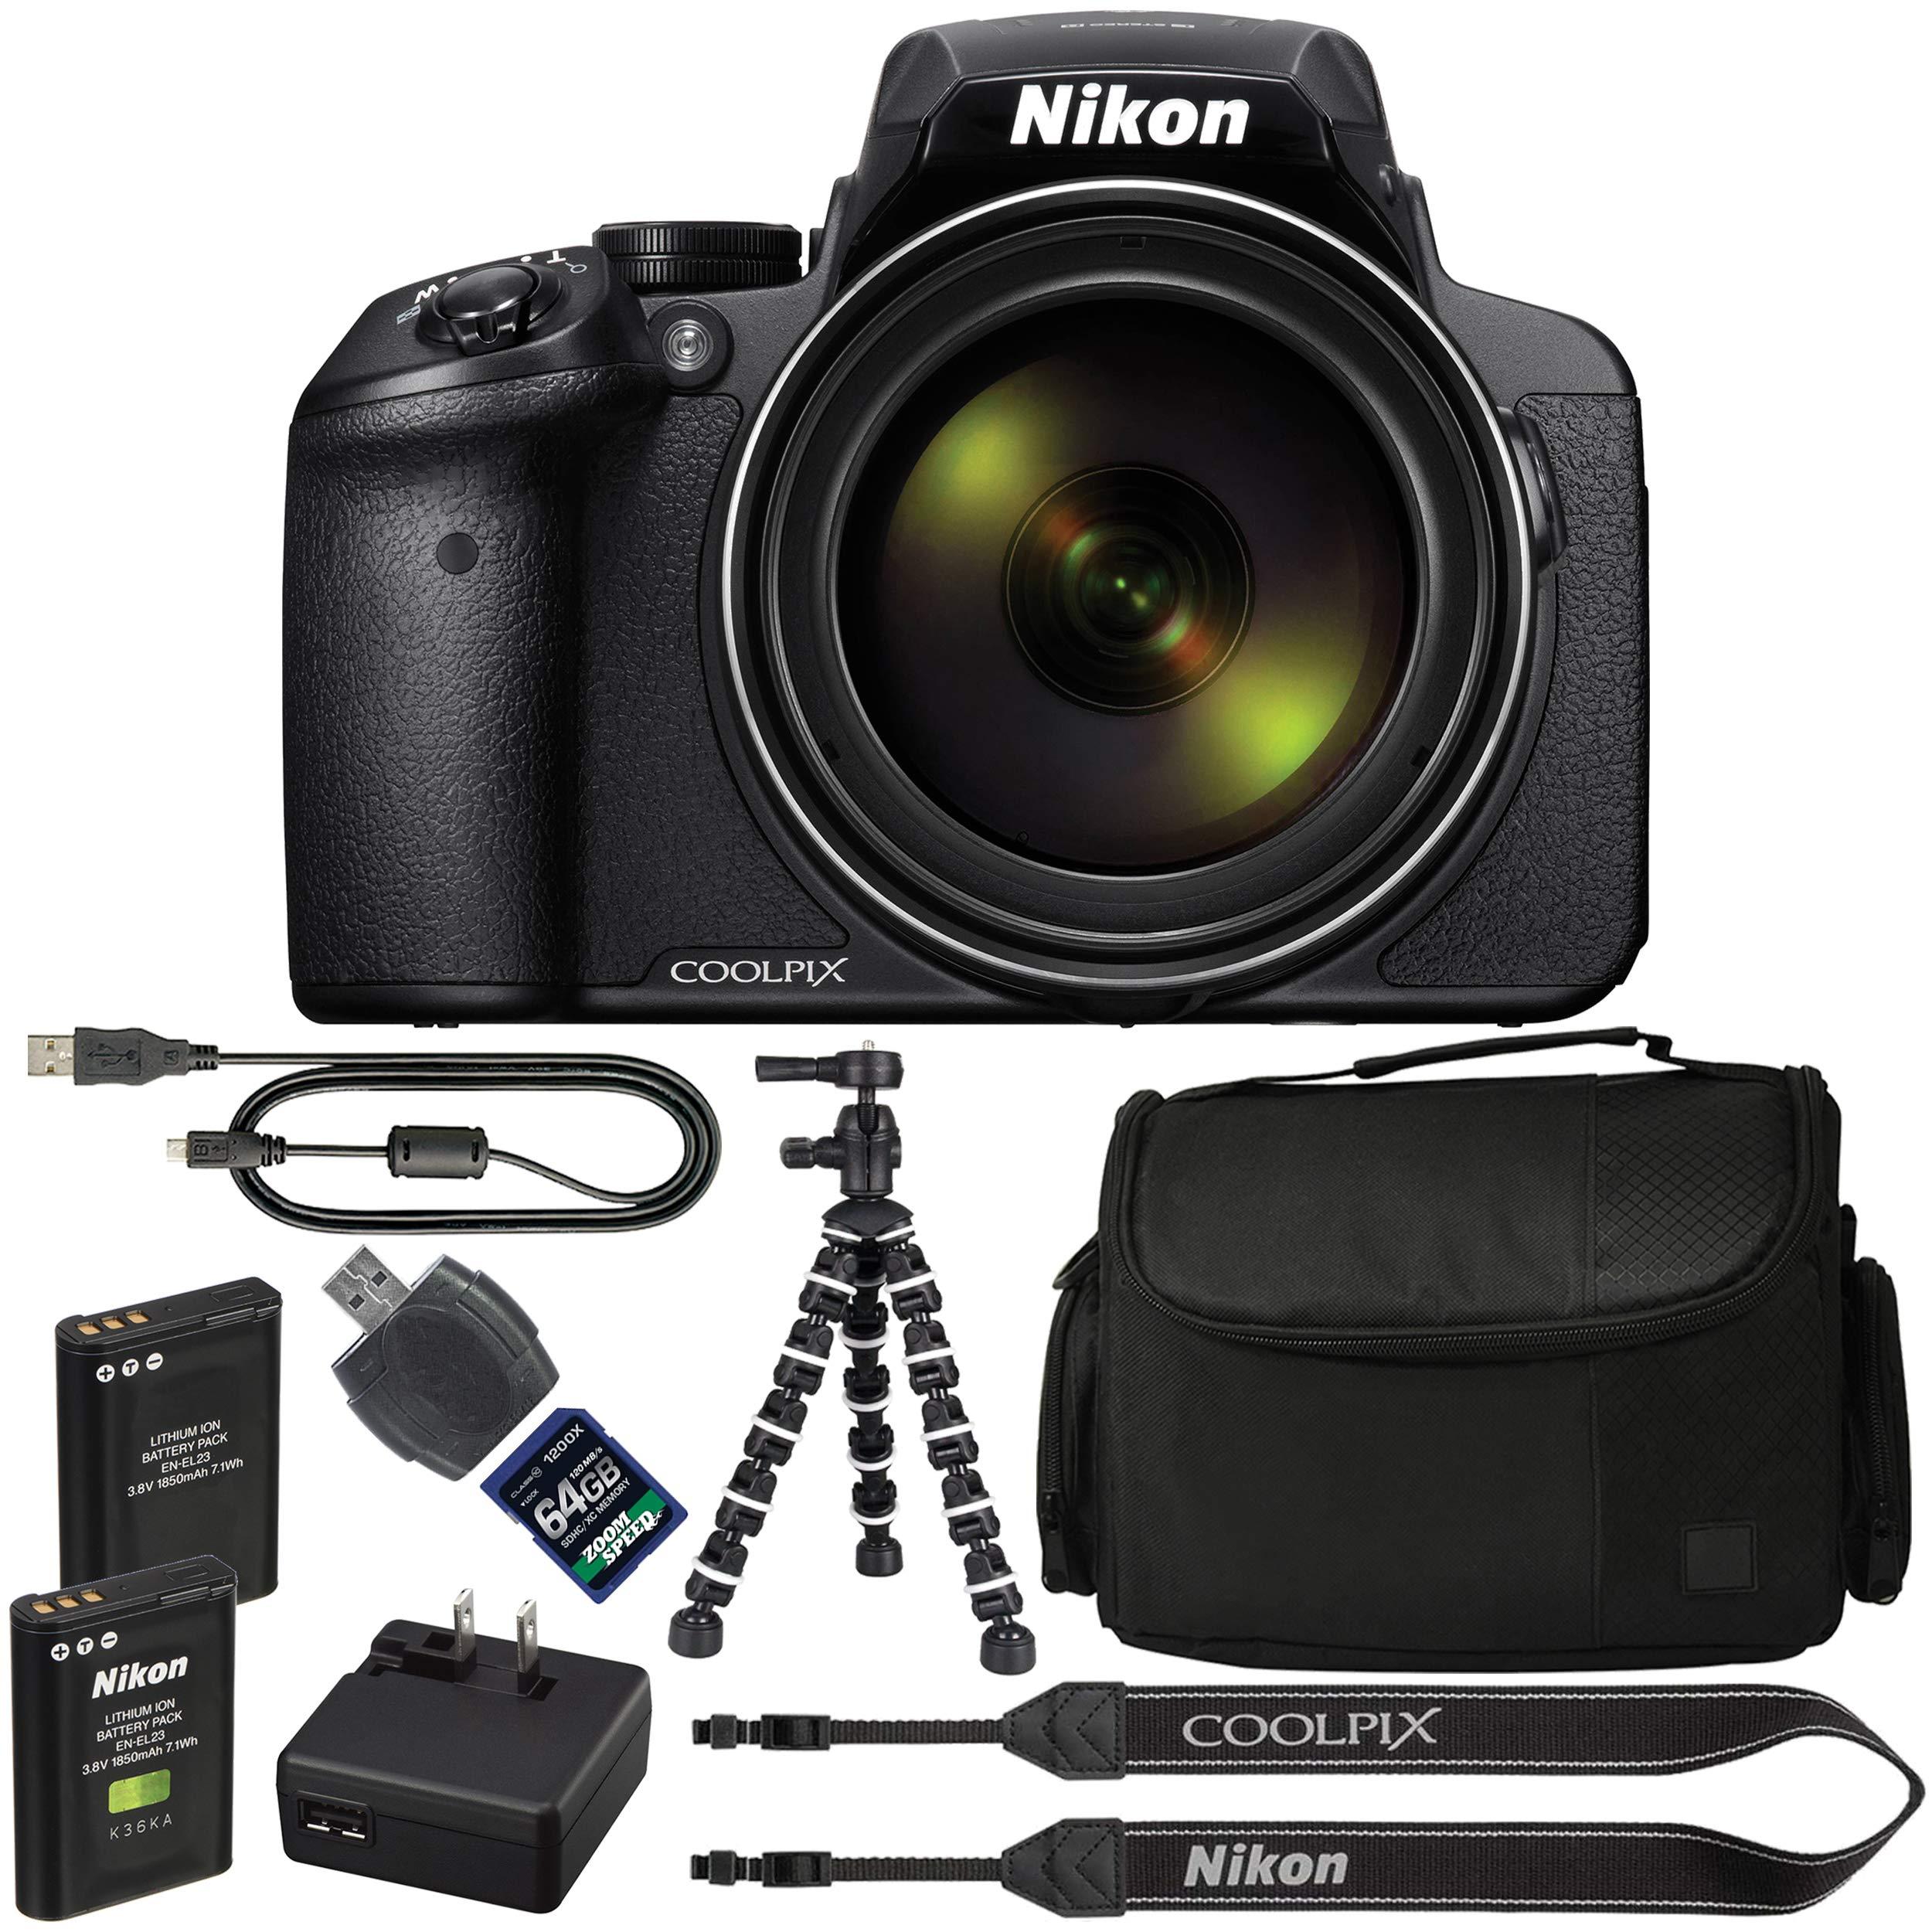 Nikon COOLPIX P900 Digital Camera: with 83x Optical Zoom and Built-in Wi-Fi(Black) + 64GB 1200X SDXC Card + 2 EN-EL23 Batteries + Case + Flexible Tripod + Pro Bundle: International Version by AOM